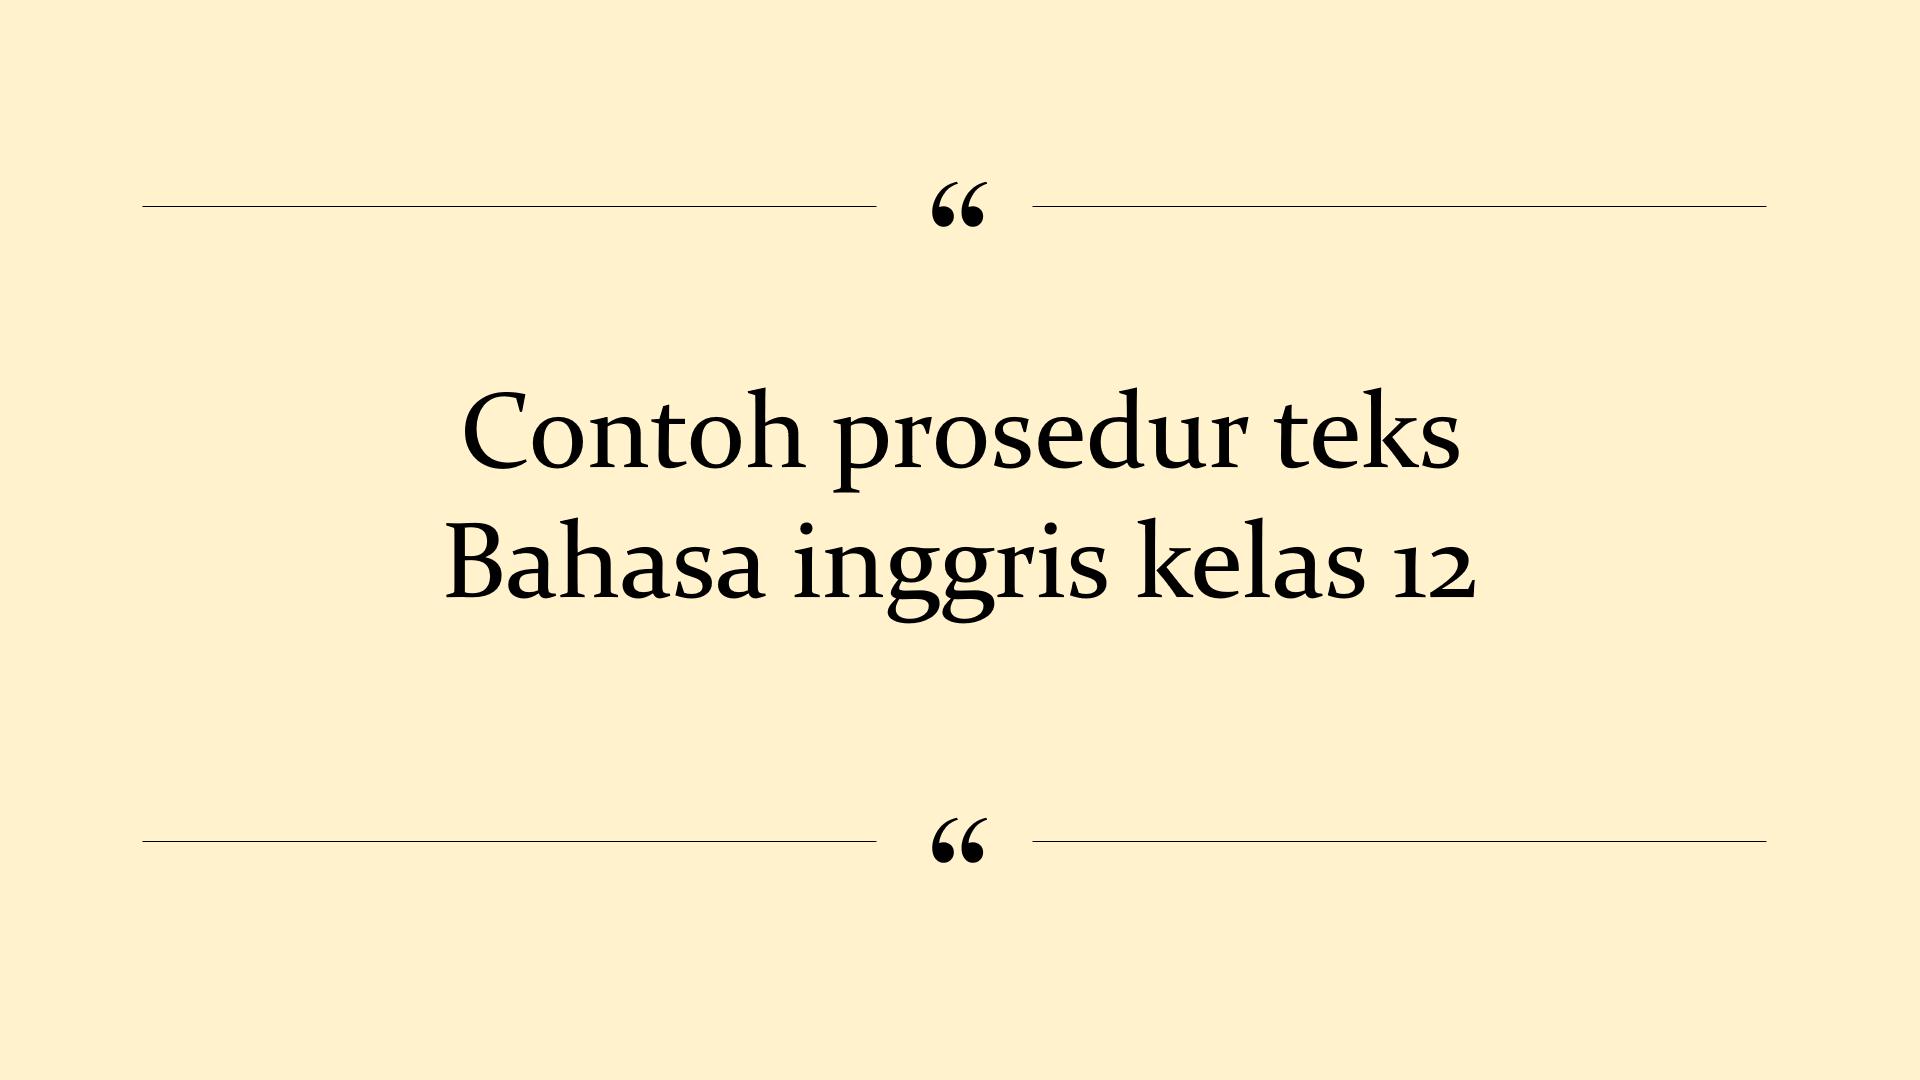 contoh prosedur teks resep masakan ketoprak   bahasa inggris